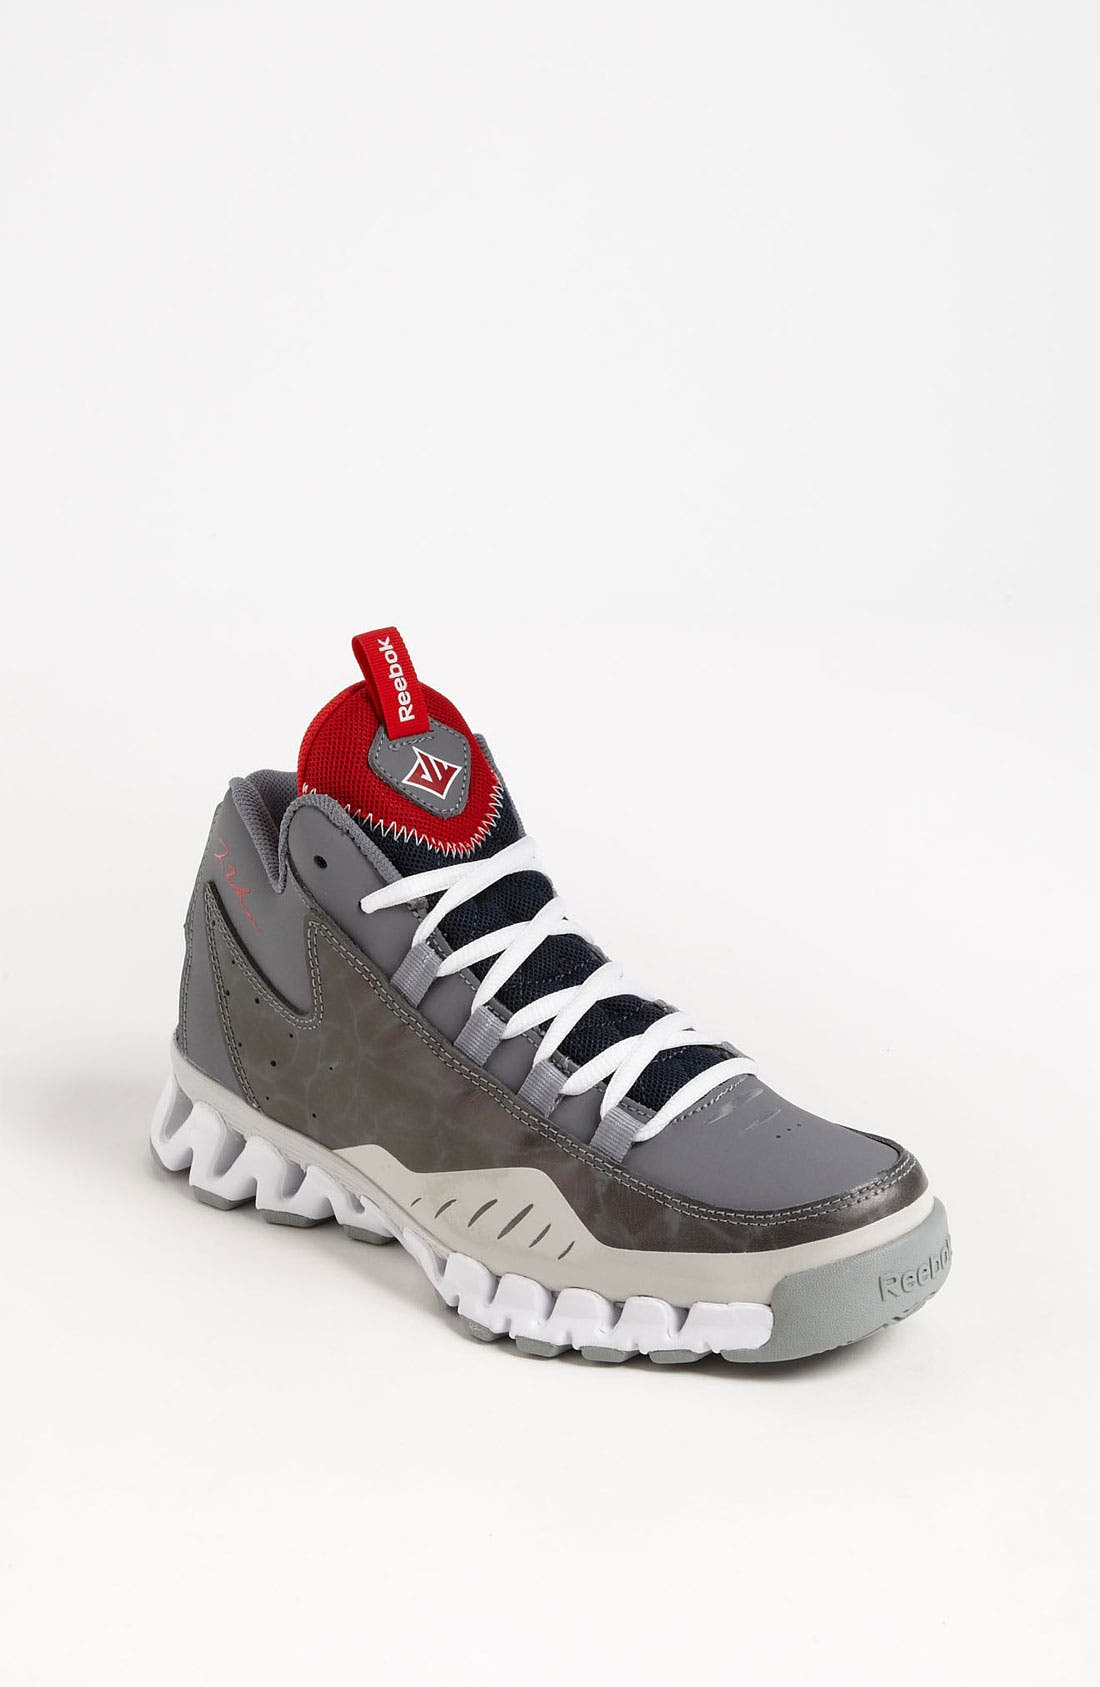 Alternate Image 1 Selected - Reebok 'Wall Season 3: ZigEscape' Basketball Shoe (Big Kids)